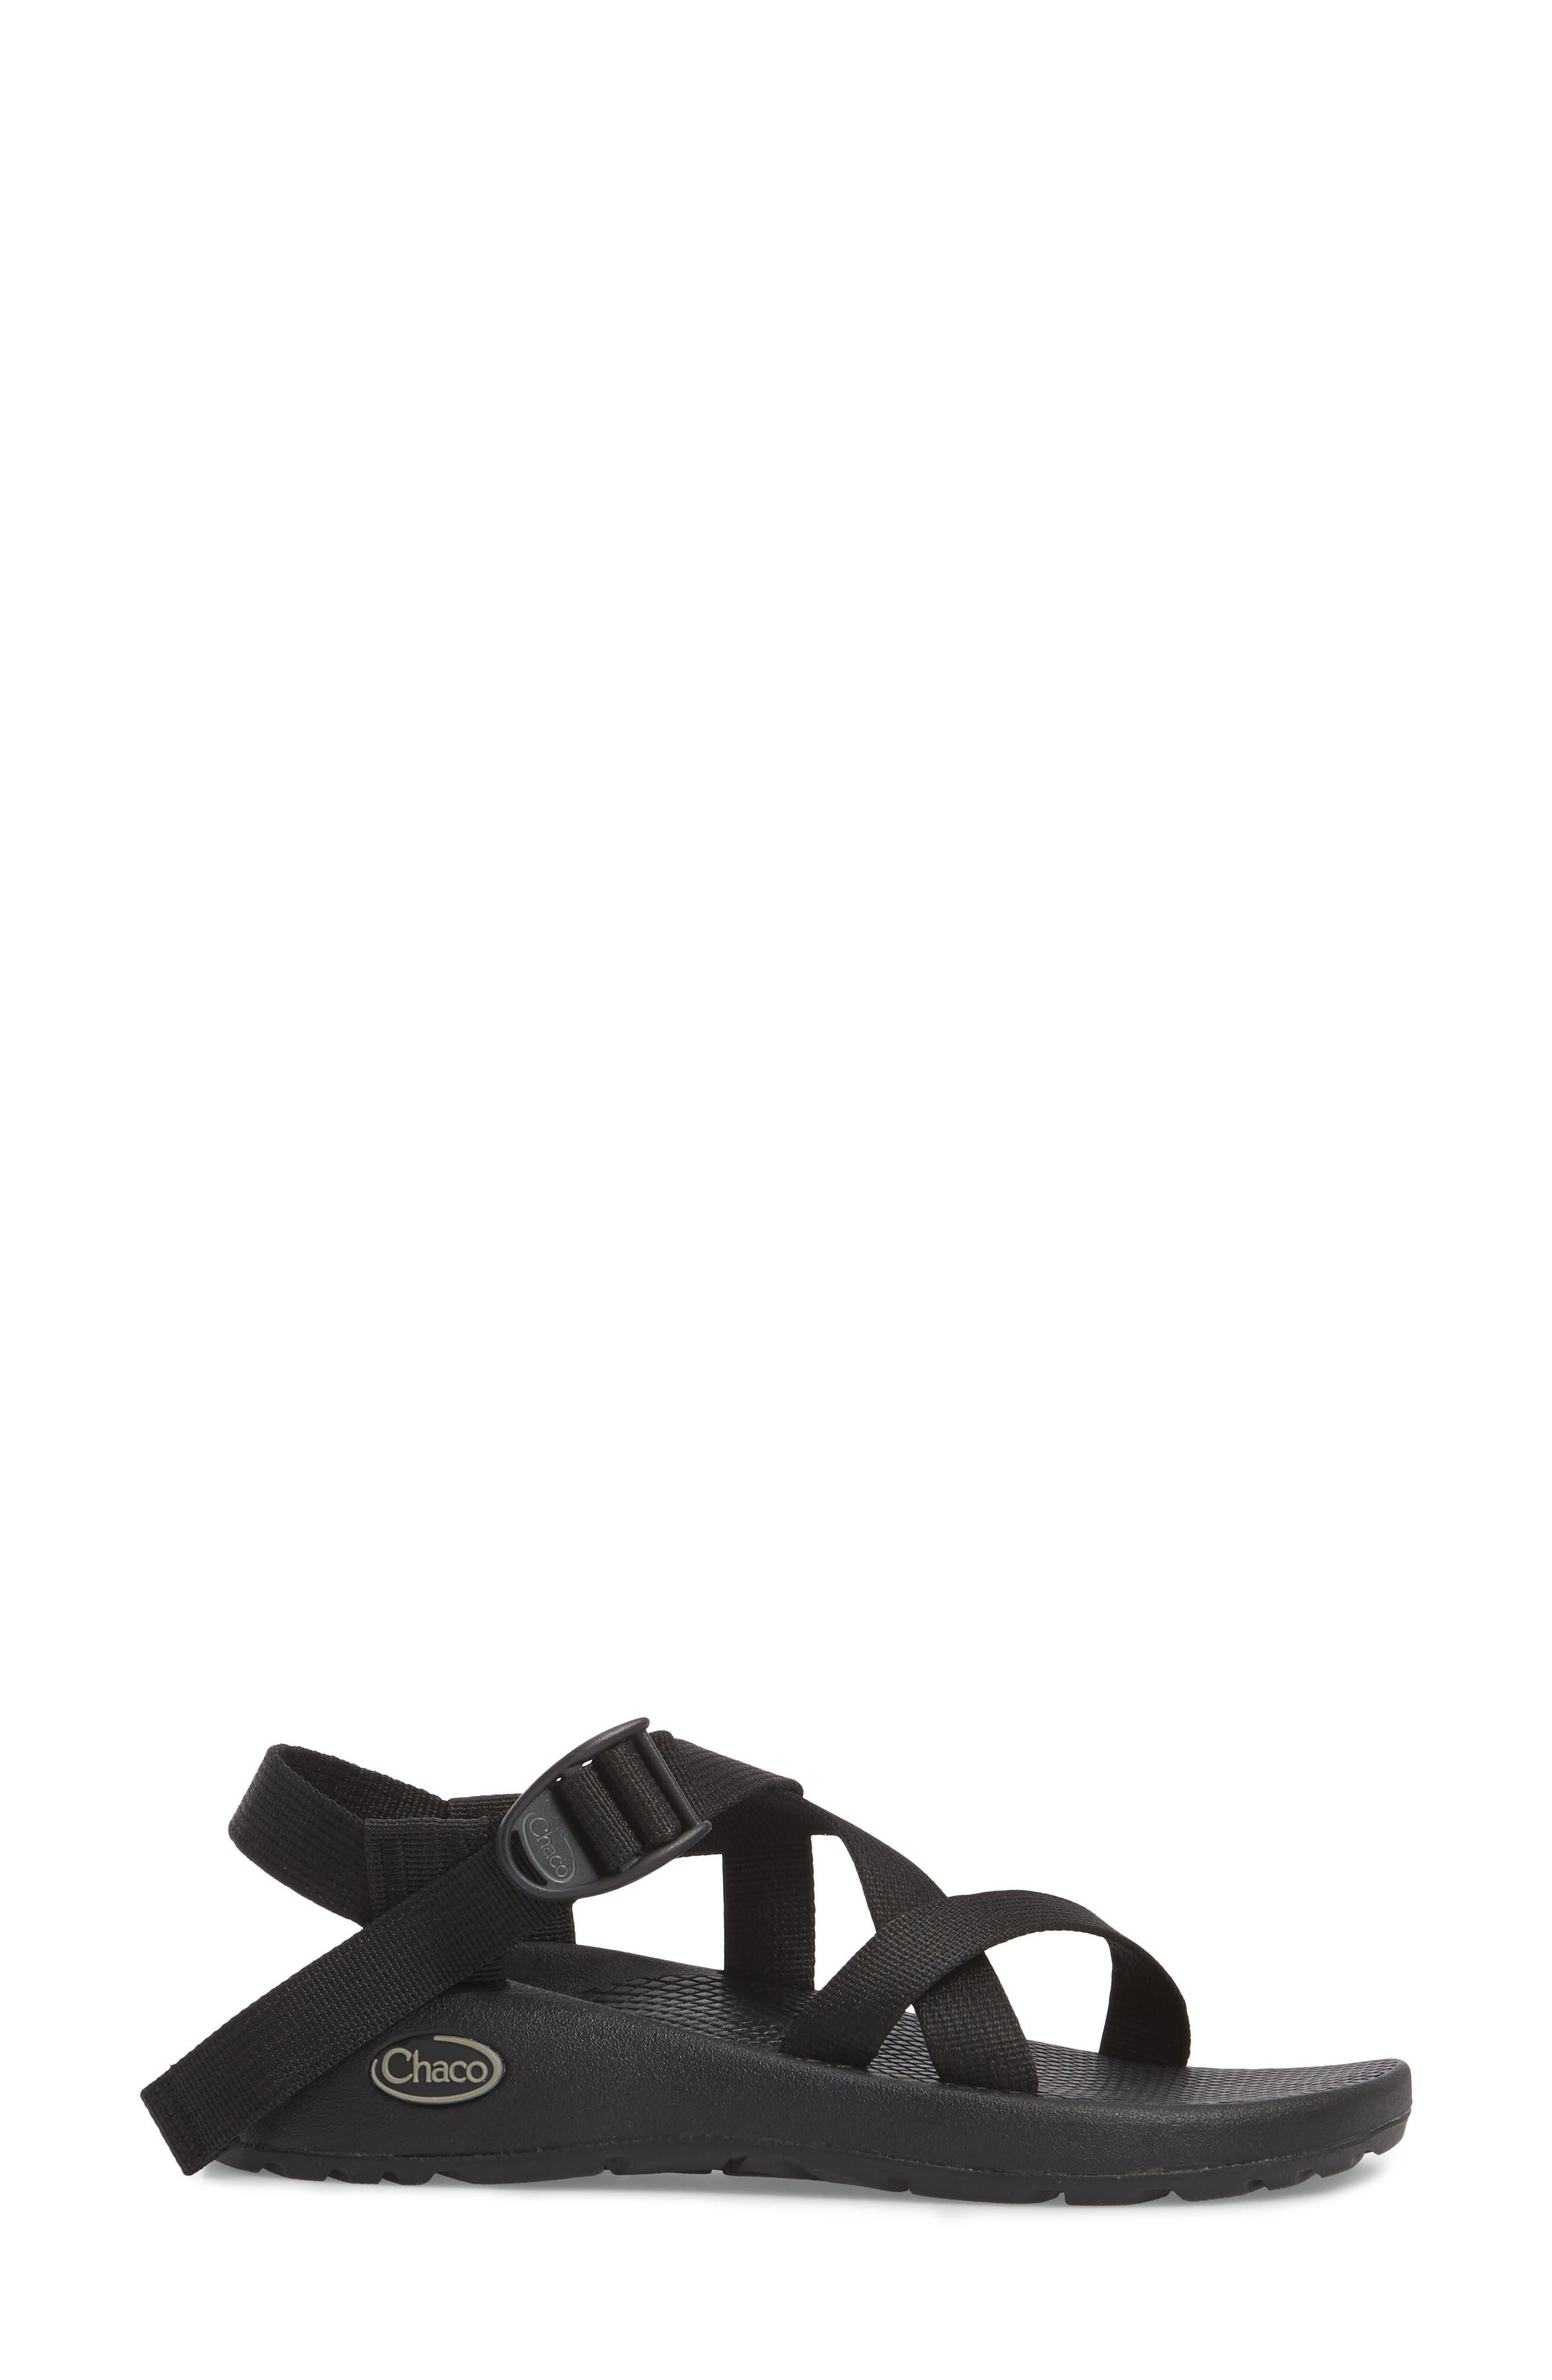 Alternate Image 3  - Chaco Z/1 Classic Sport Sandal (Women)